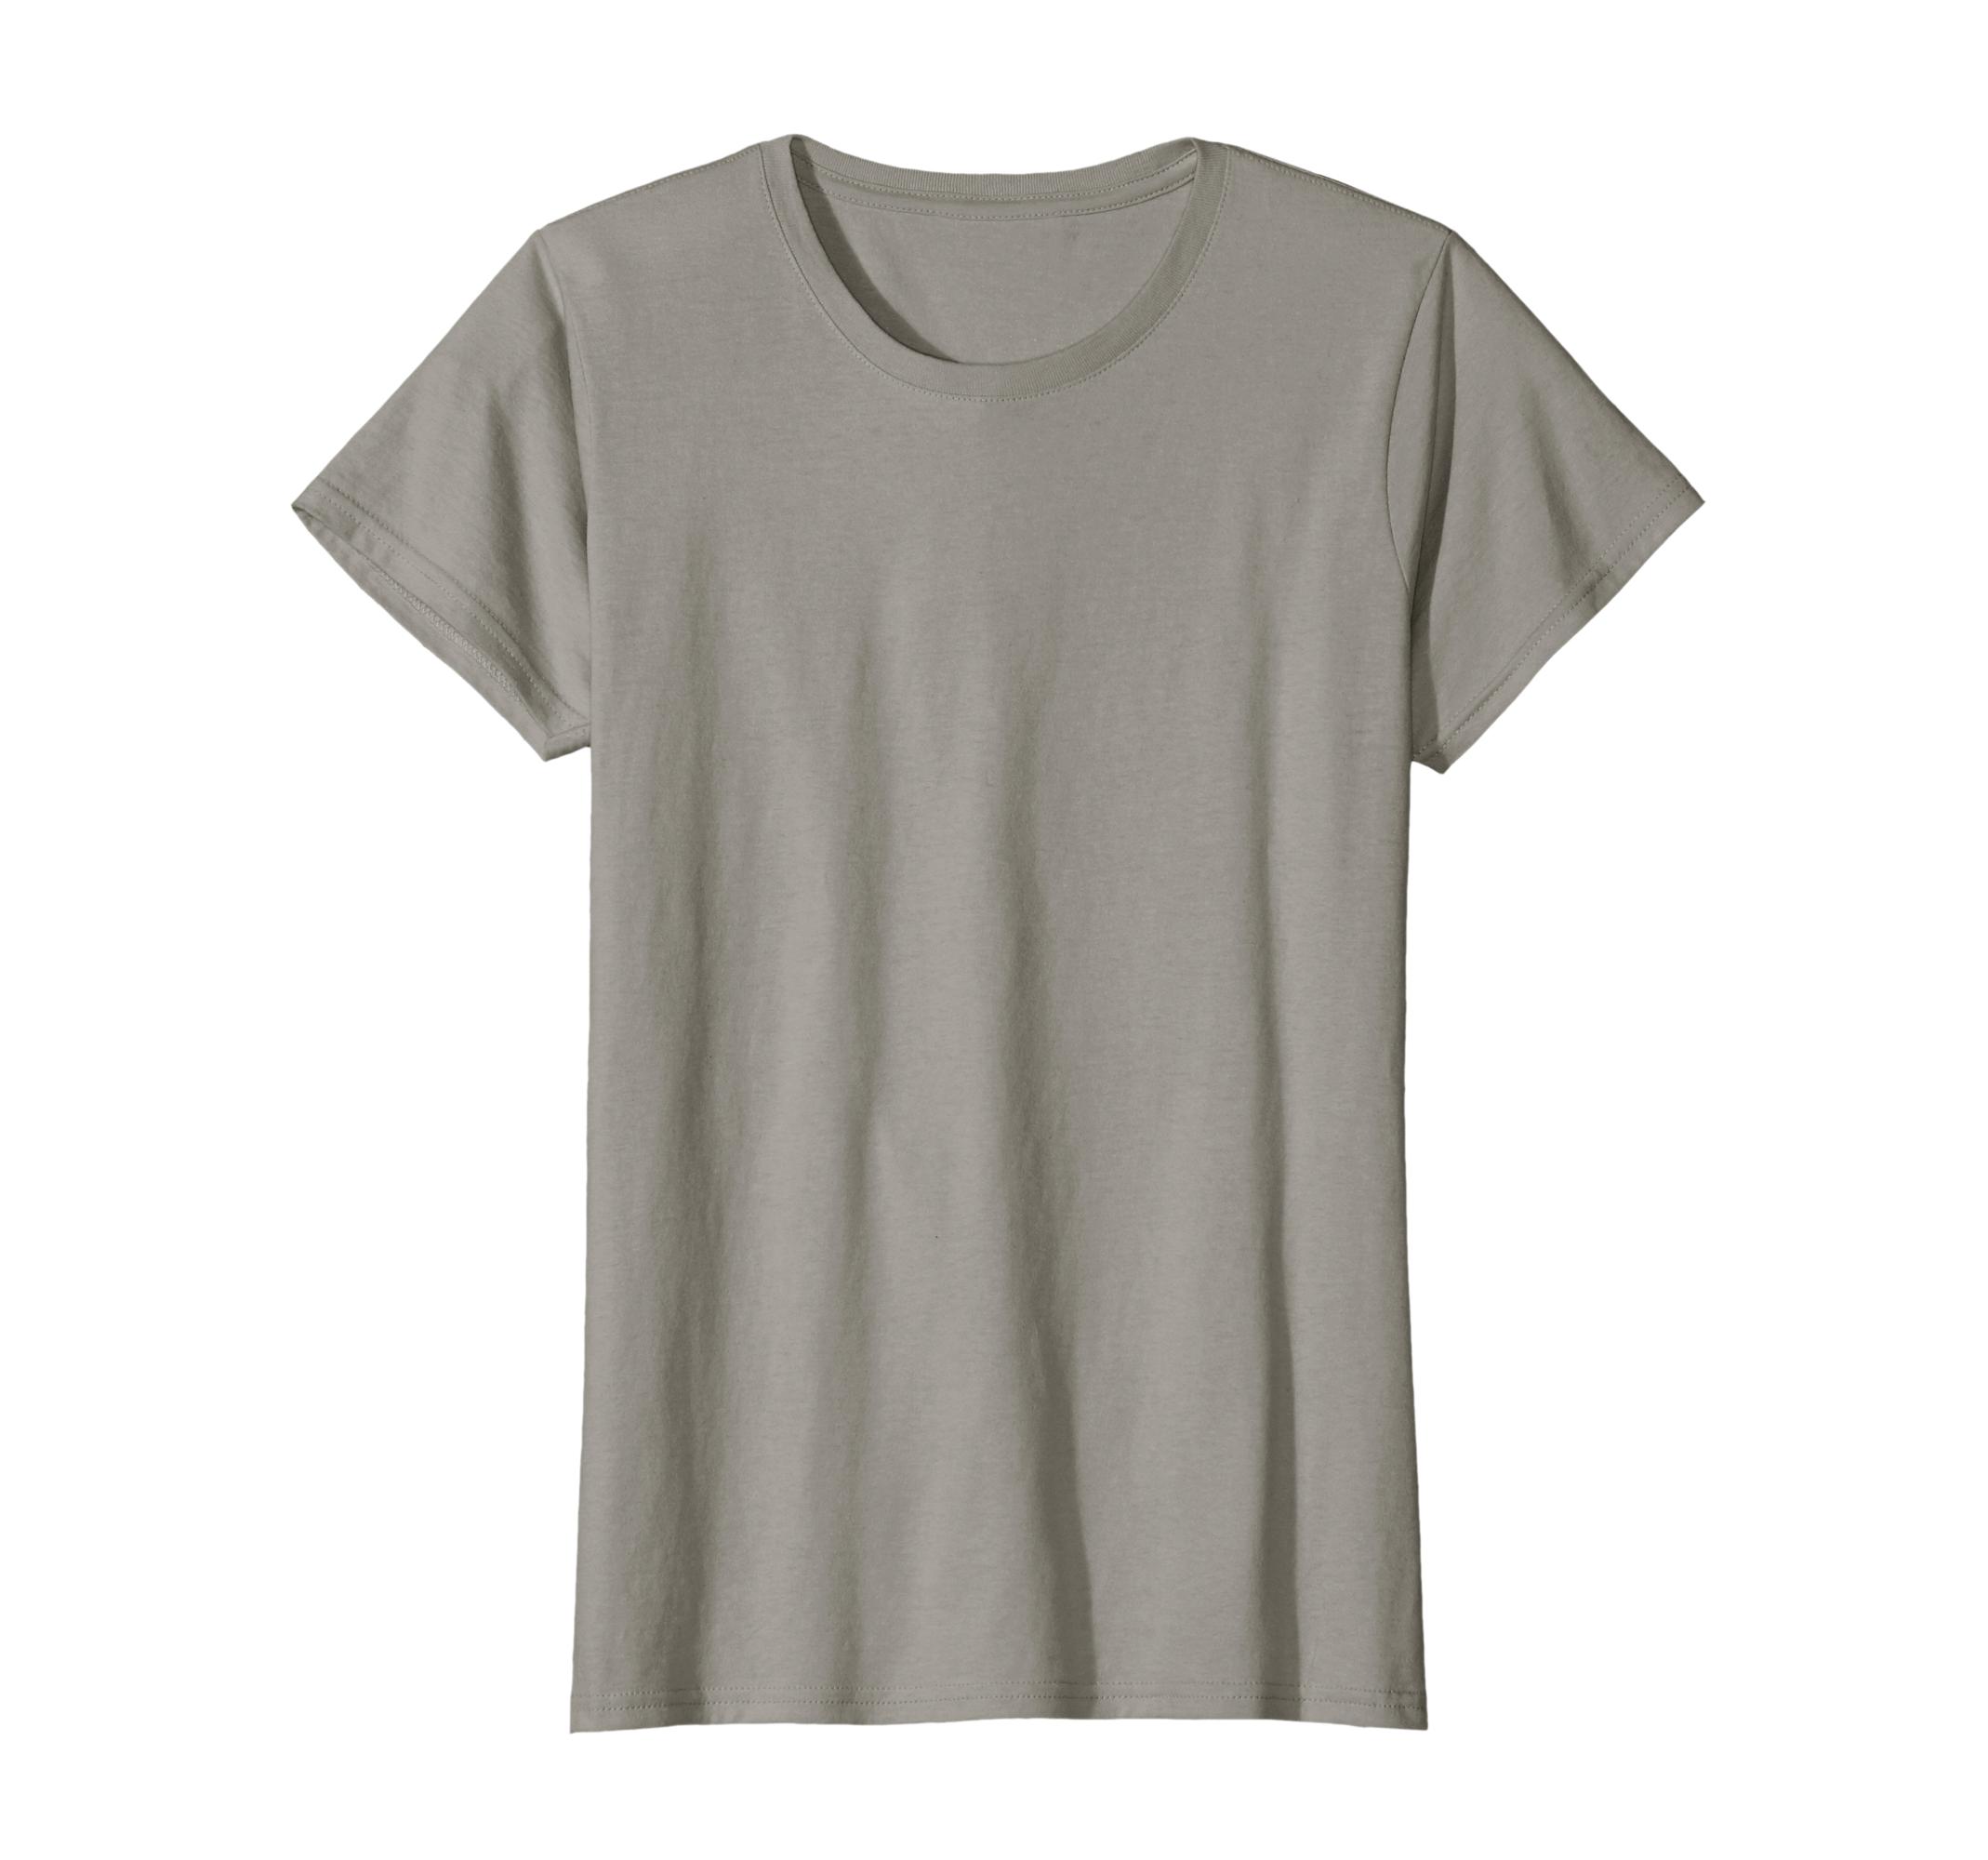 Tek Gear T-Shirt Top DryTek GO RUN Gray V Neck Short Sleeve Shirt Running